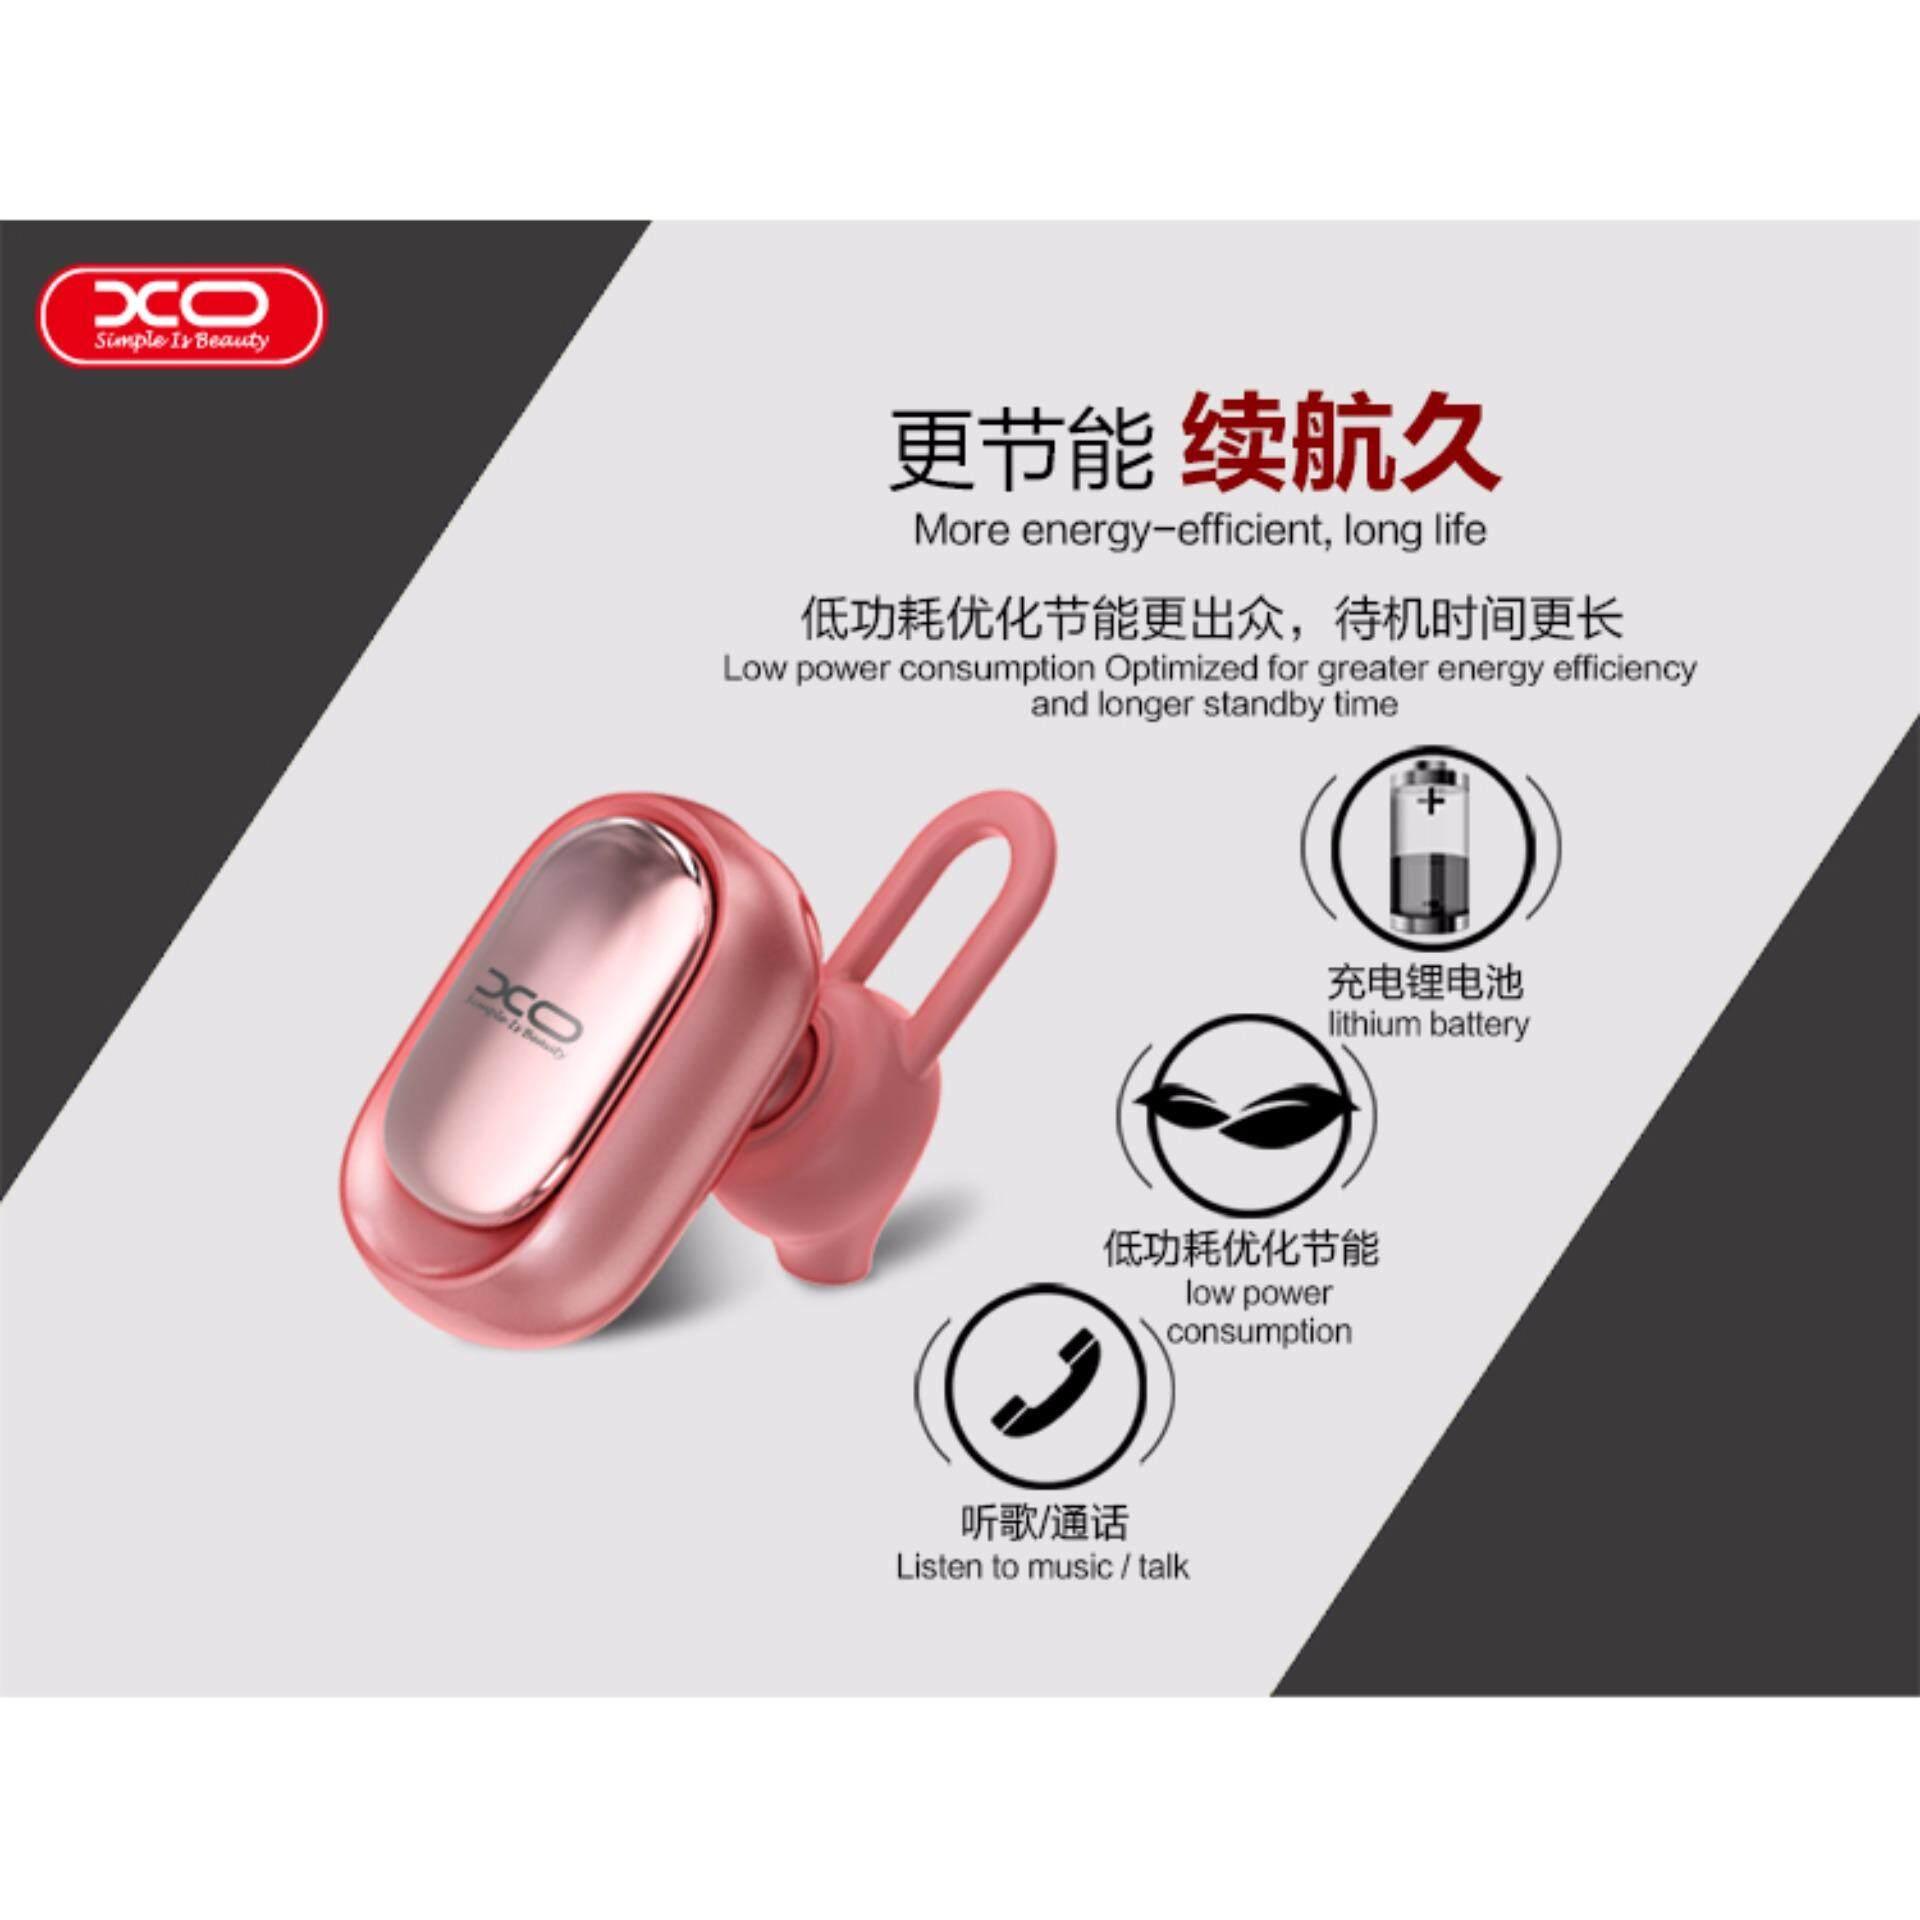 Review หูฟัง Unbranded/Generic Wireless Headset (Black) คลิ๊กรับคูปองส่วนลด